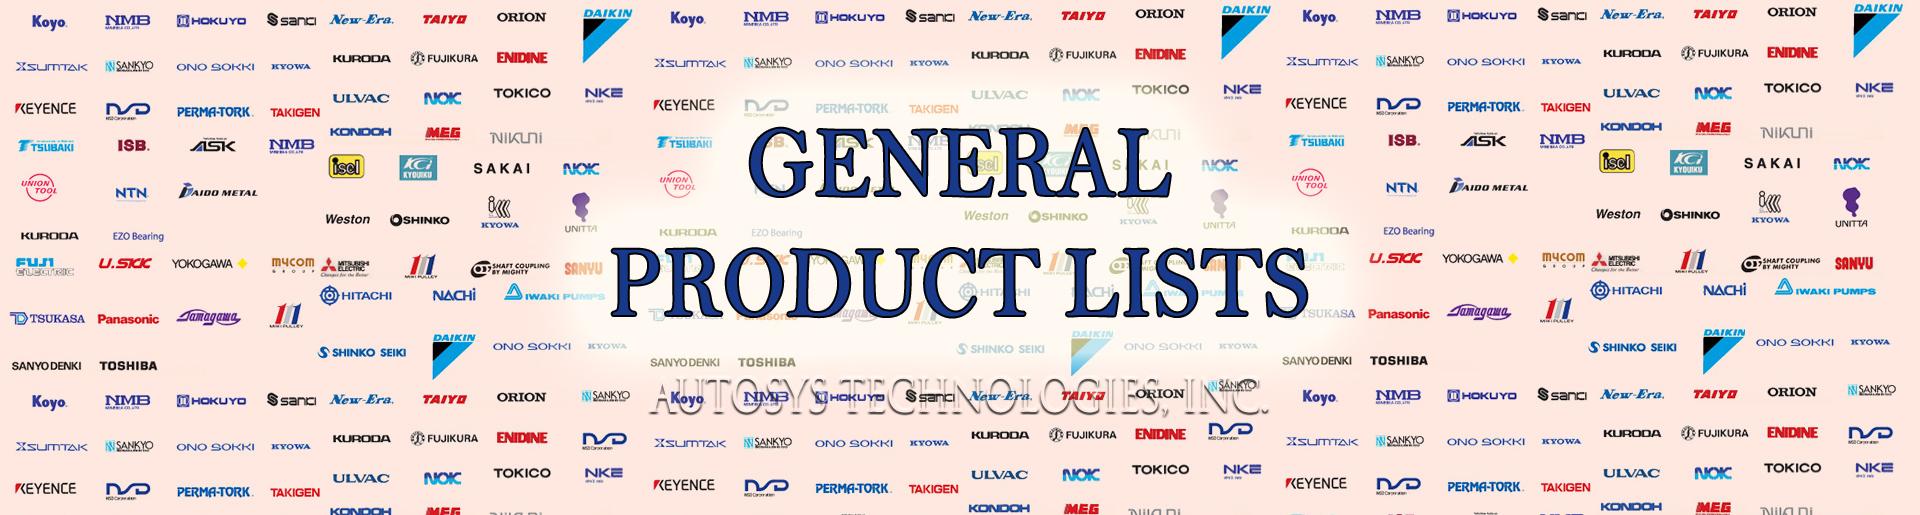 Autosys list all machines